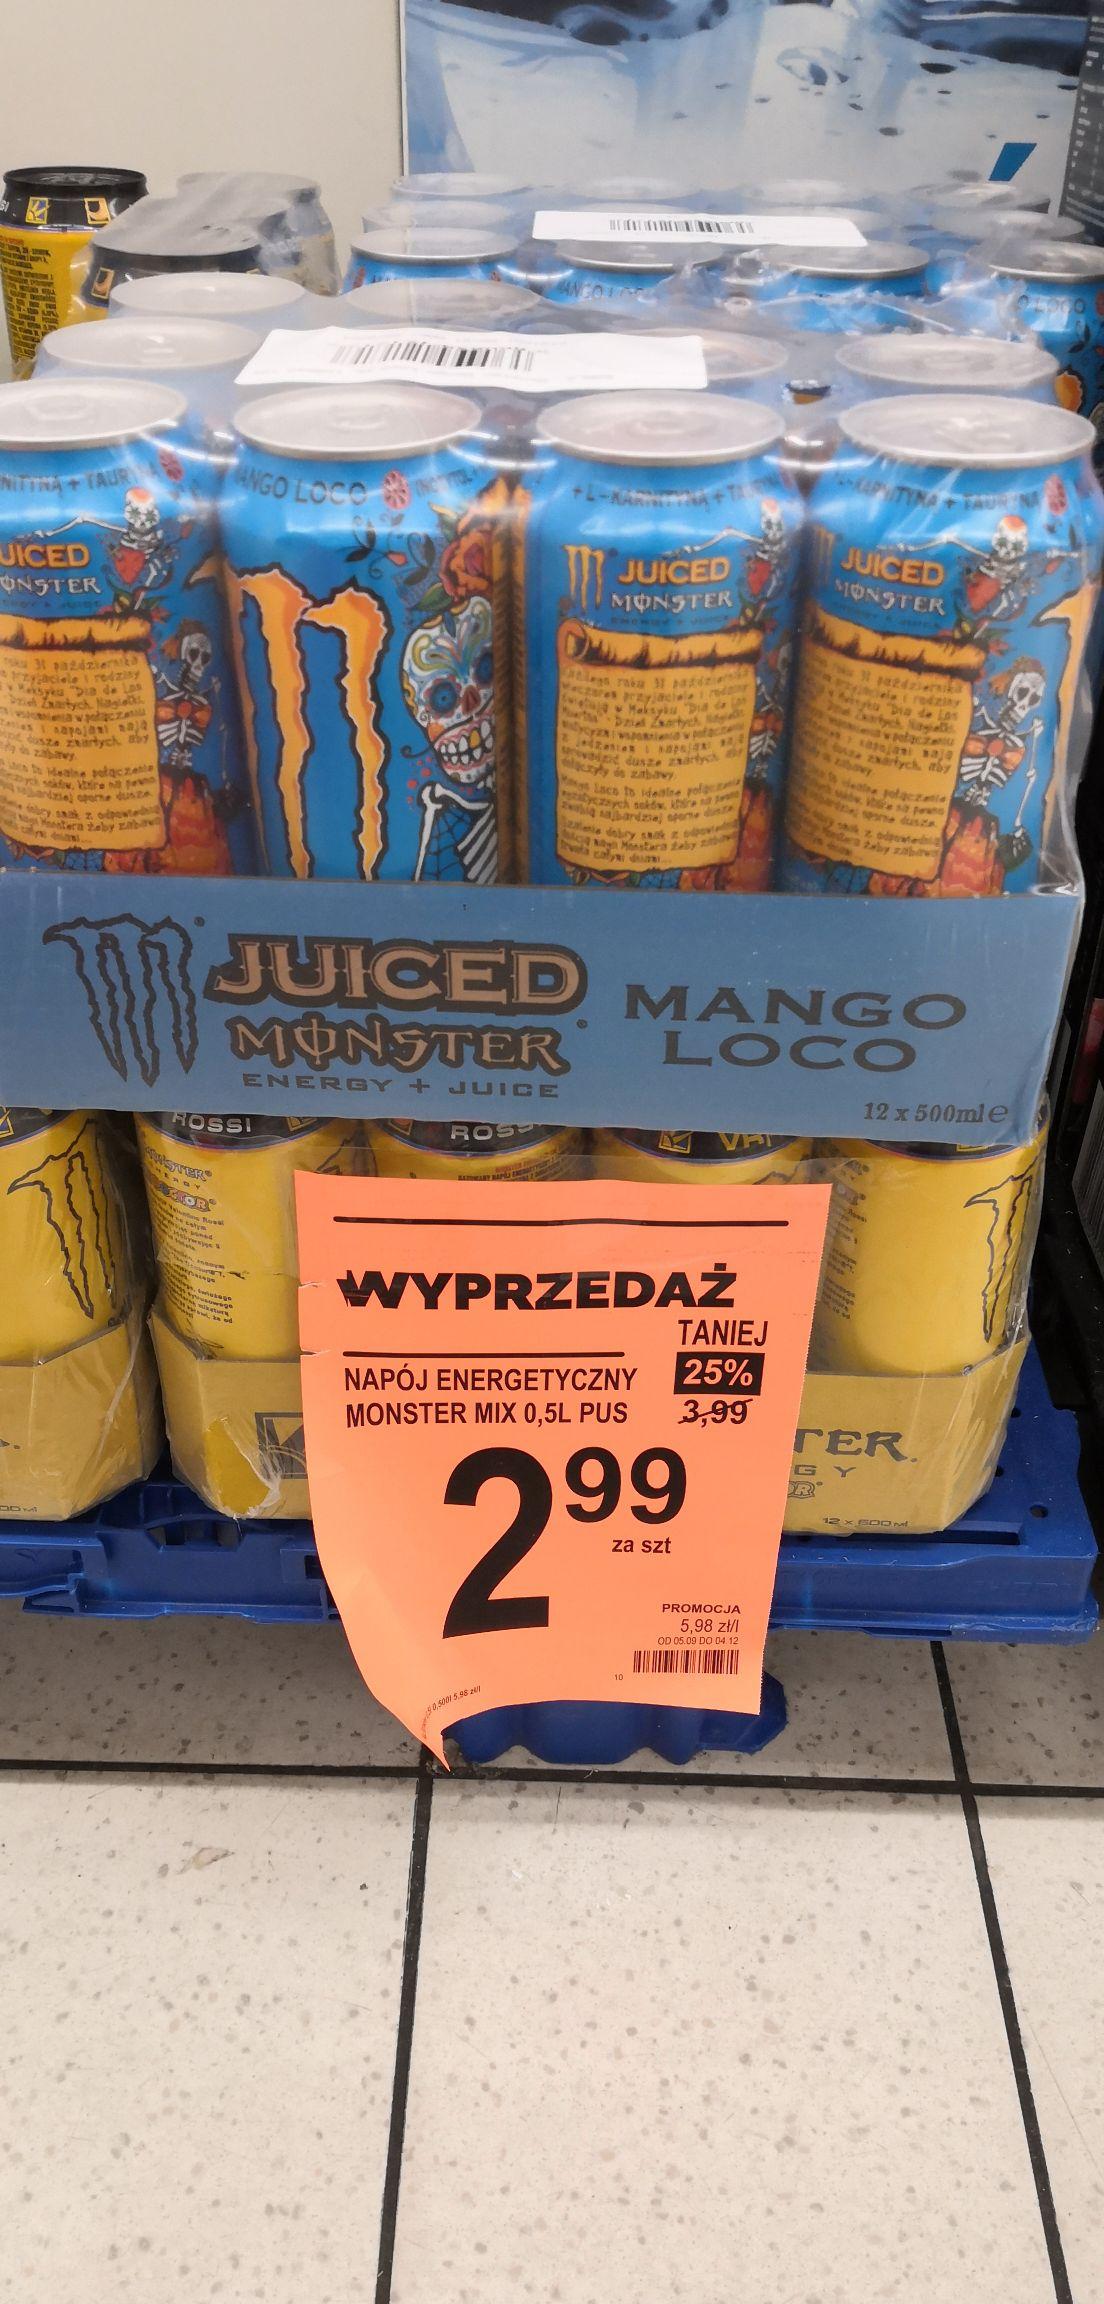 Monsterek Biedronka Mango Loco Doctor